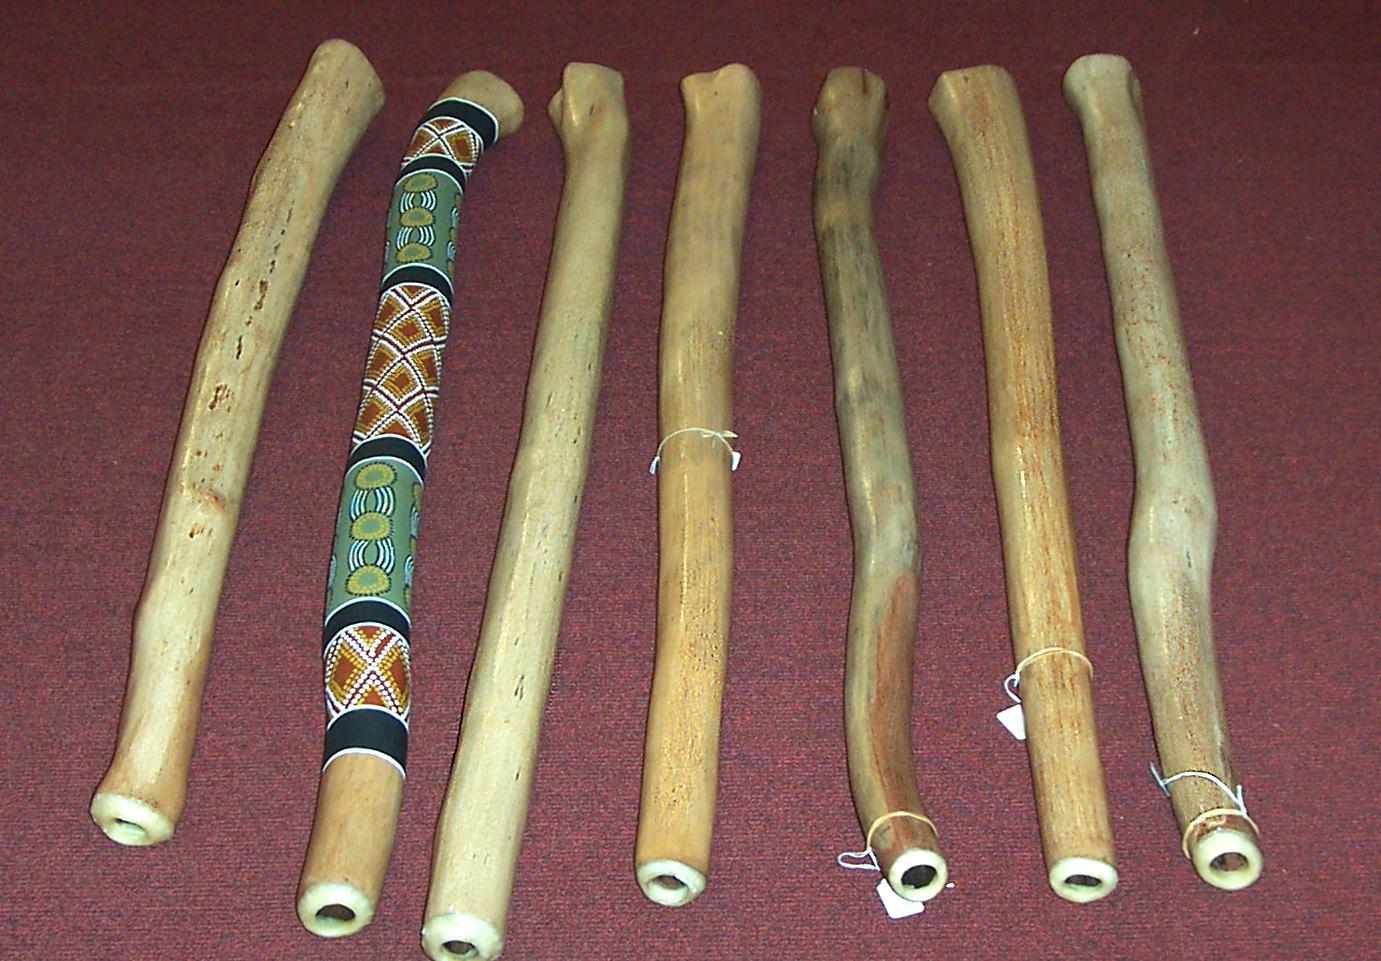 Blank didgeridoos